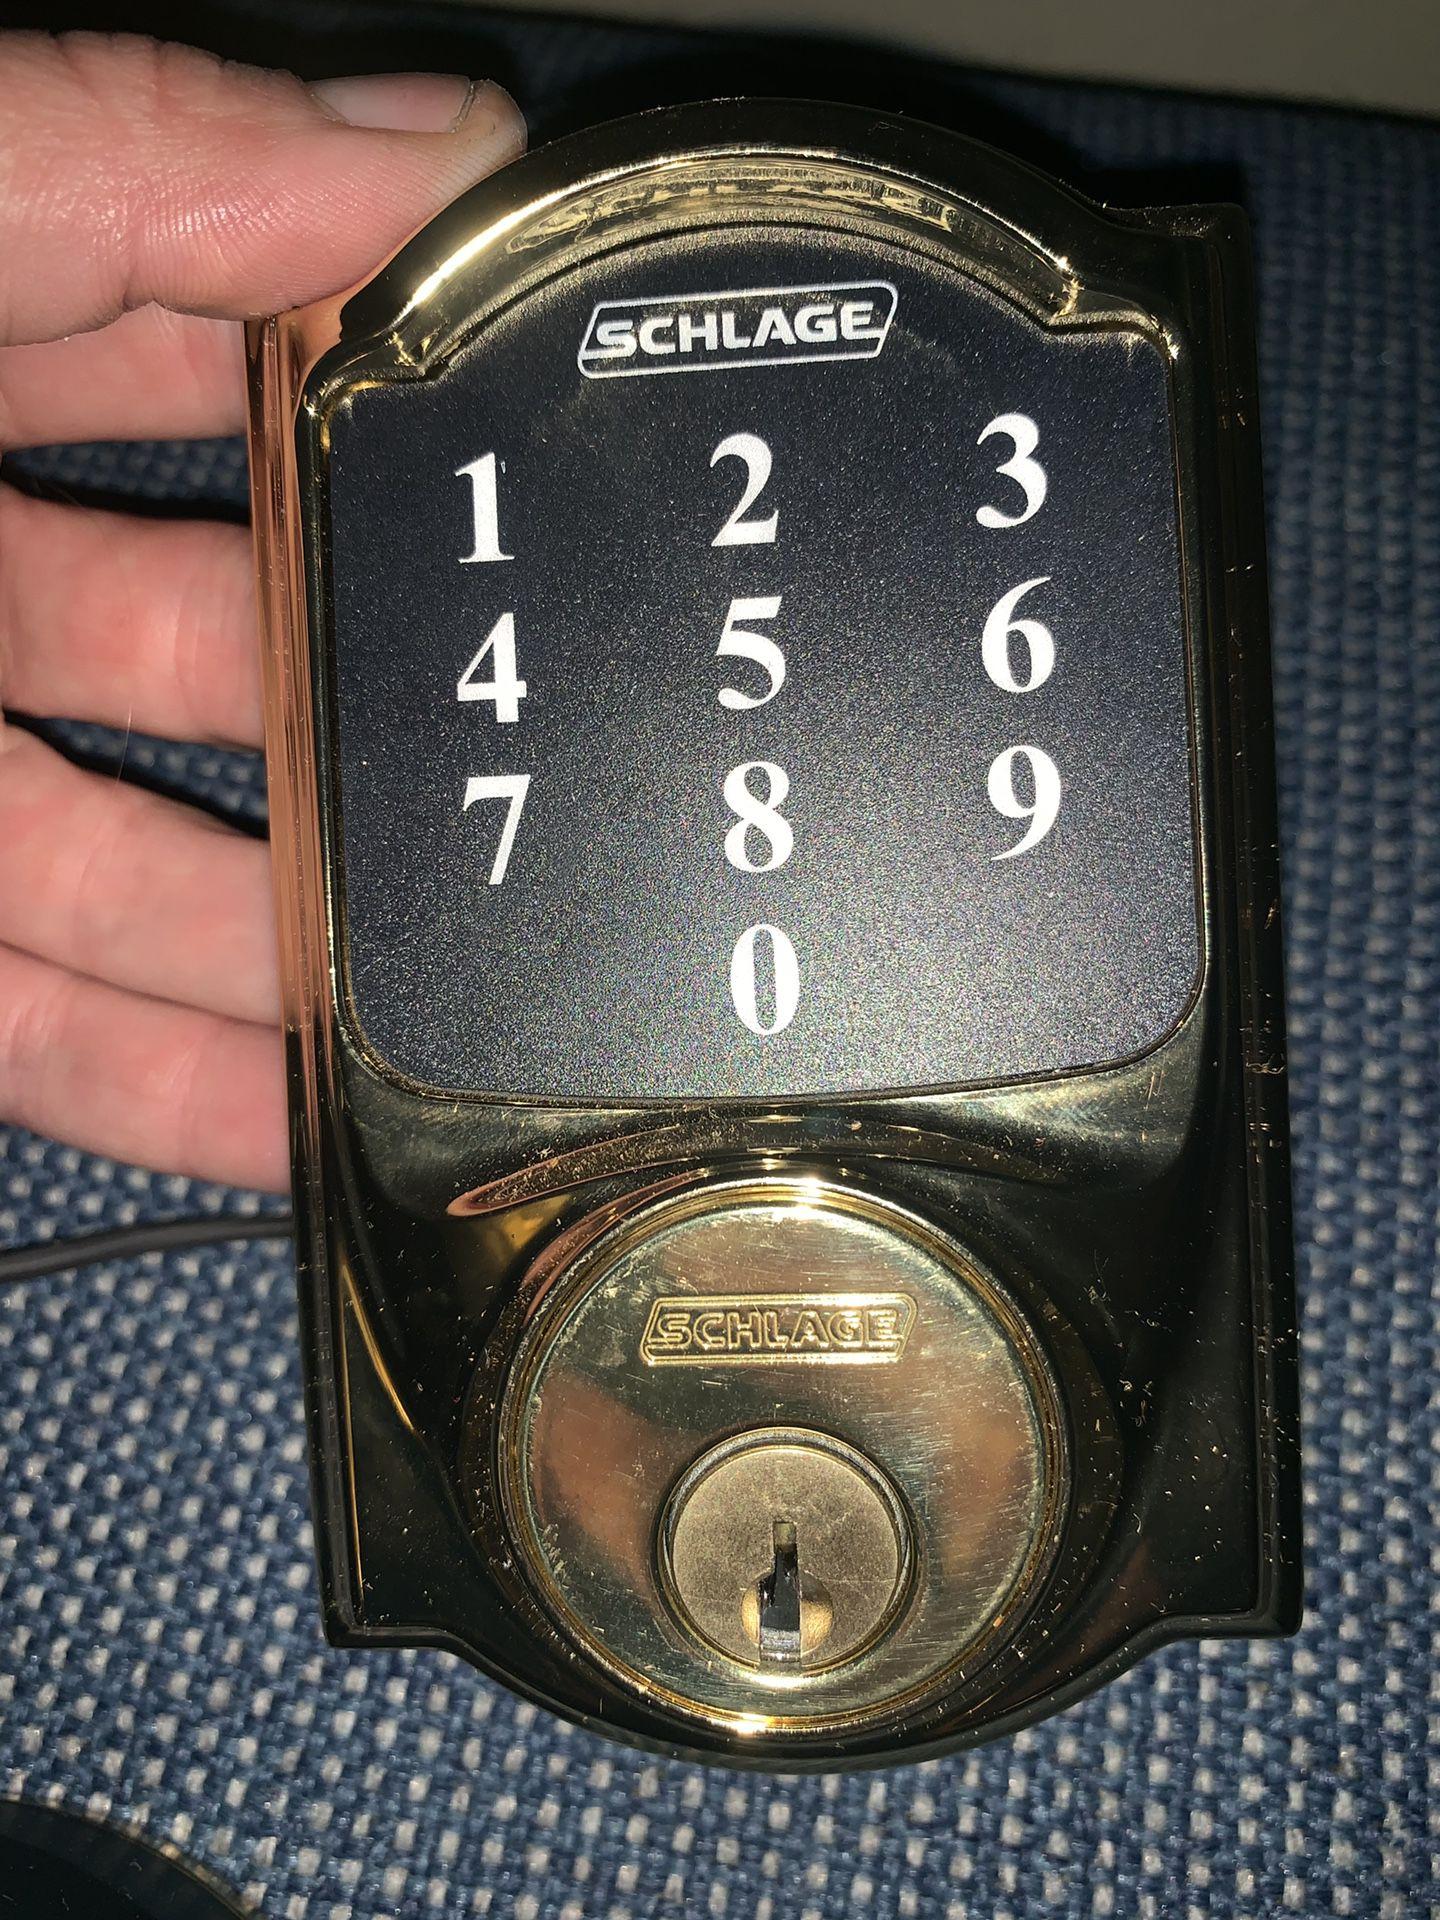 Schlage keyless entry pin pad